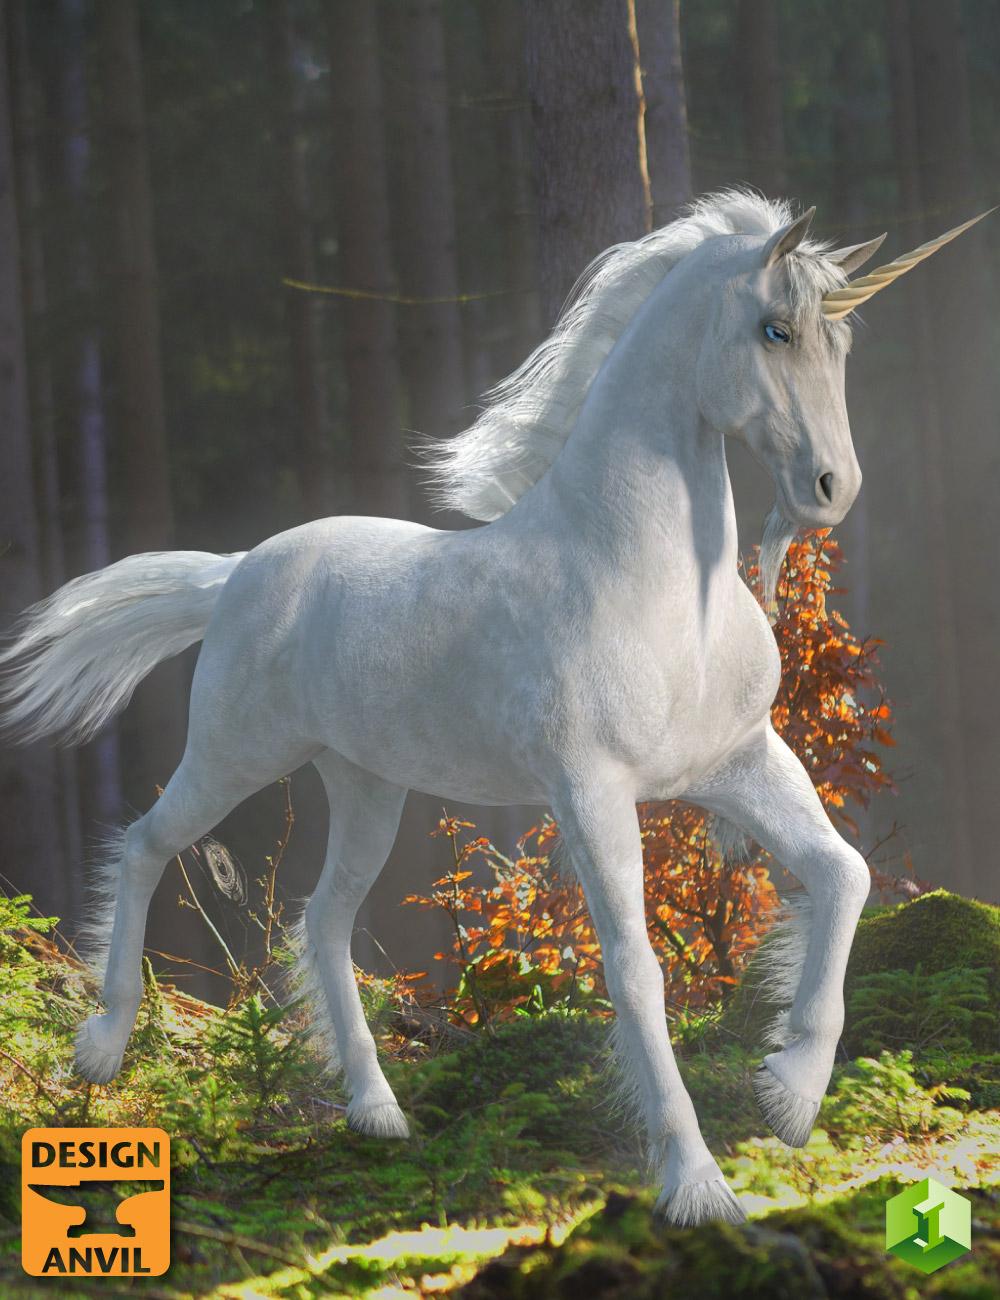 DA Unicorn for Daz Horse 2 by: Design Anvil, 3D Models by Daz 3D